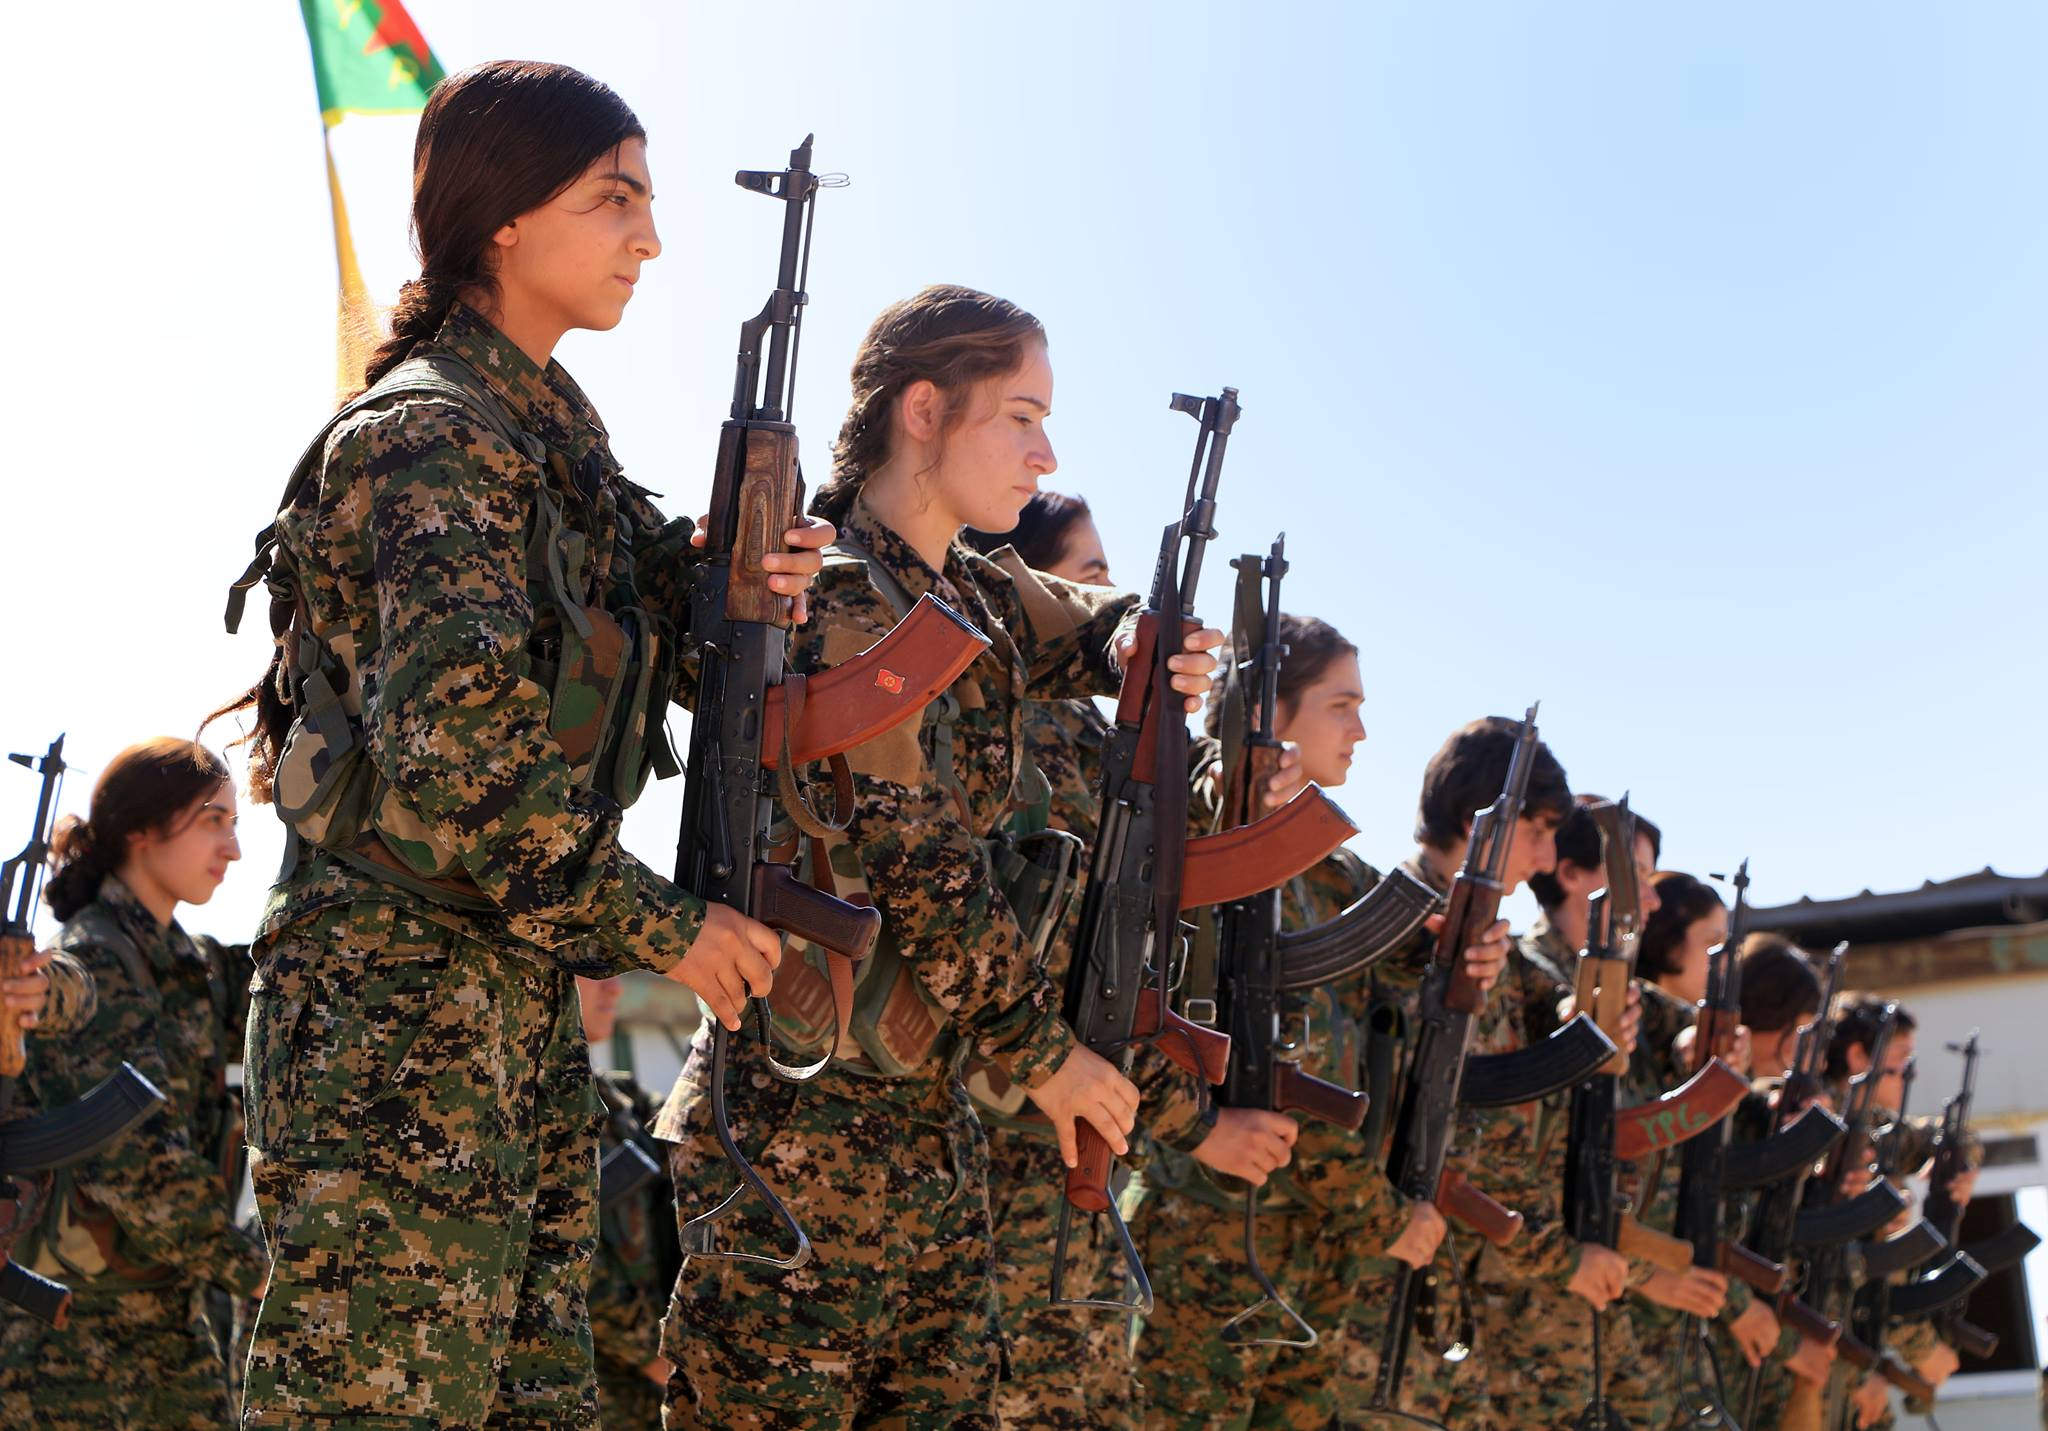 https://upload.wikimedia.org/wikipedia/commons/1/19/Kurdish_YPG_Fighters_%2830358638660%29.jpg